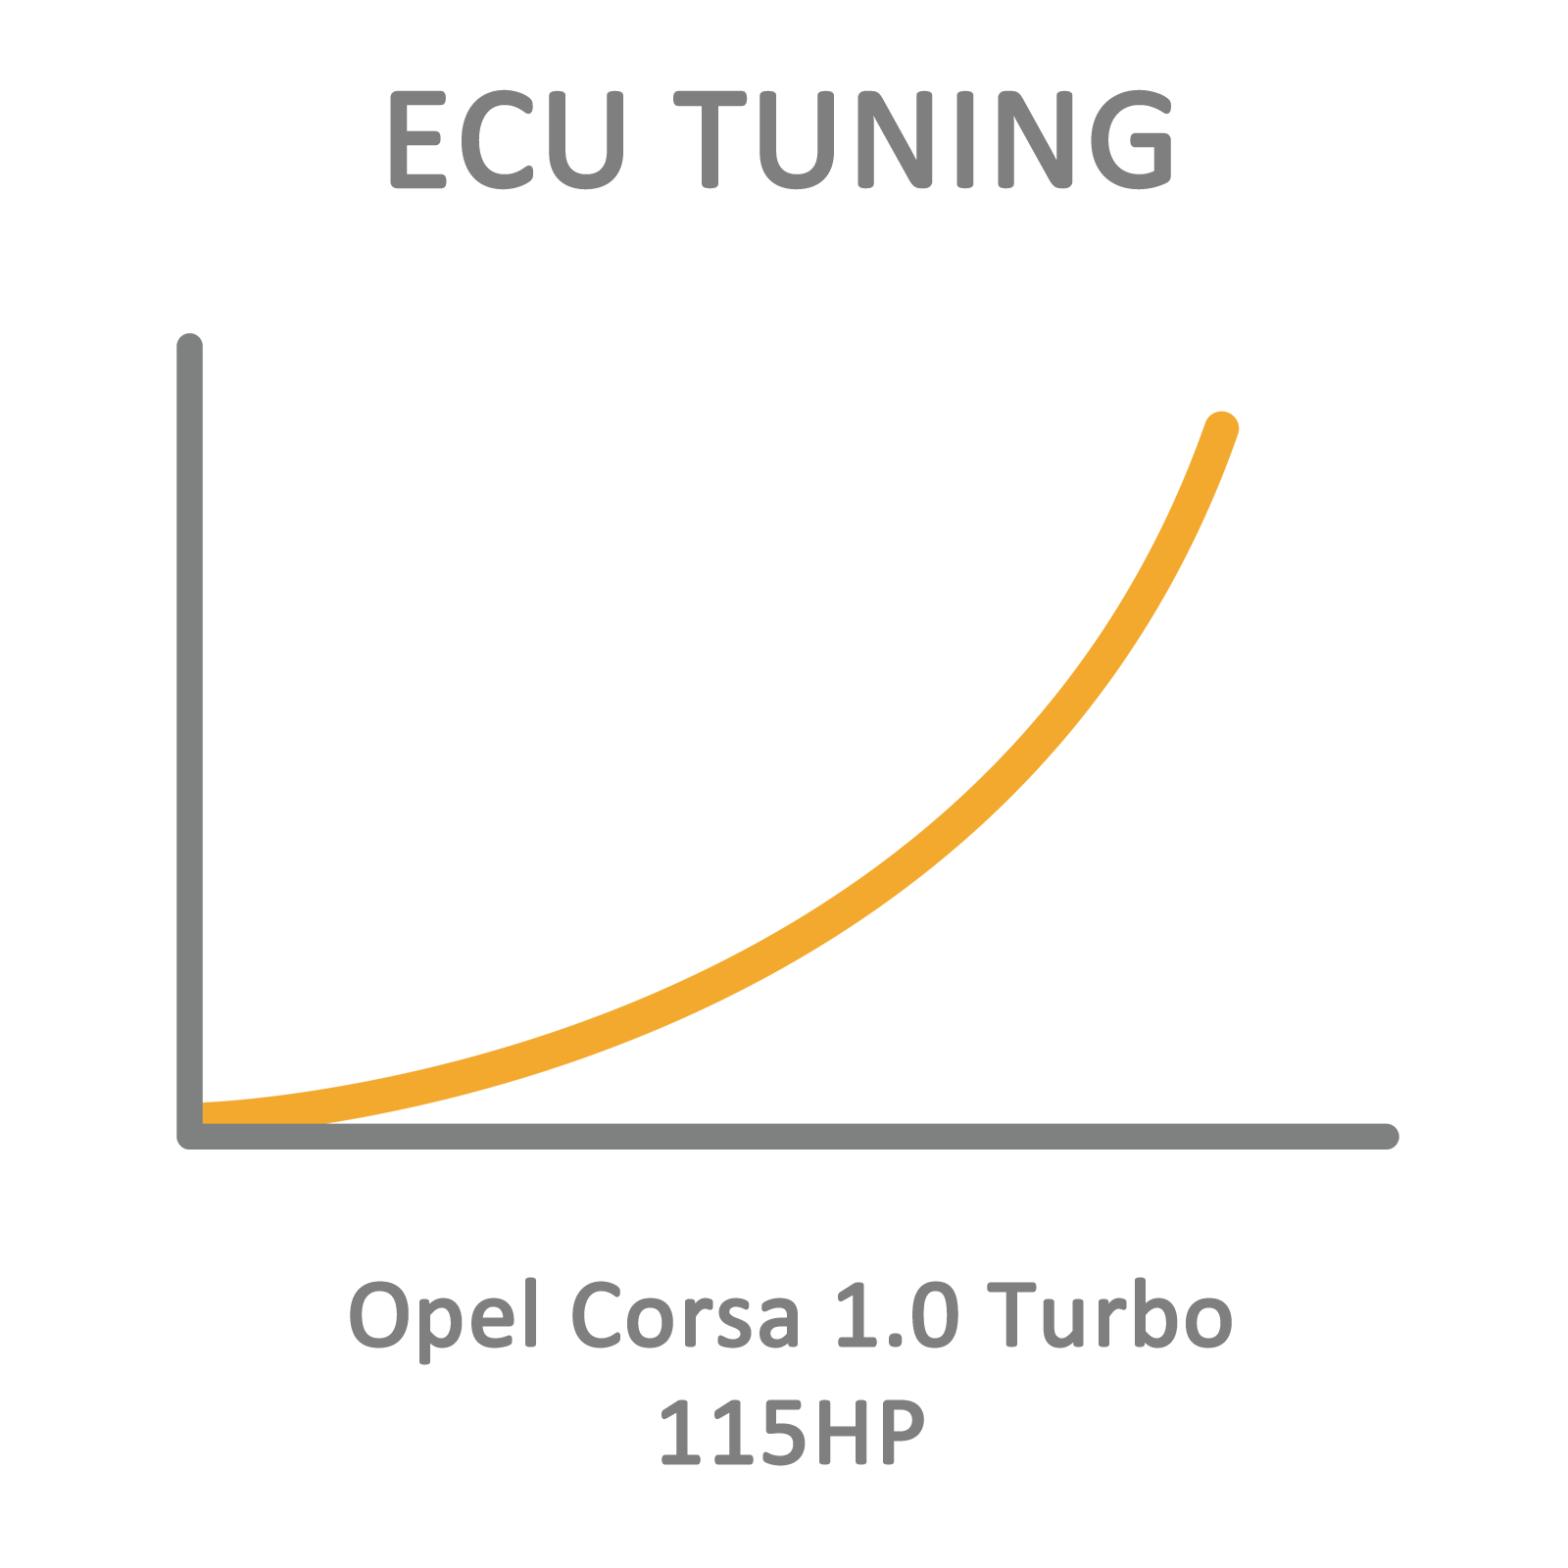 Opel Corsa 1.0 Turbo 115HP ECU Tuning Remapping Programming